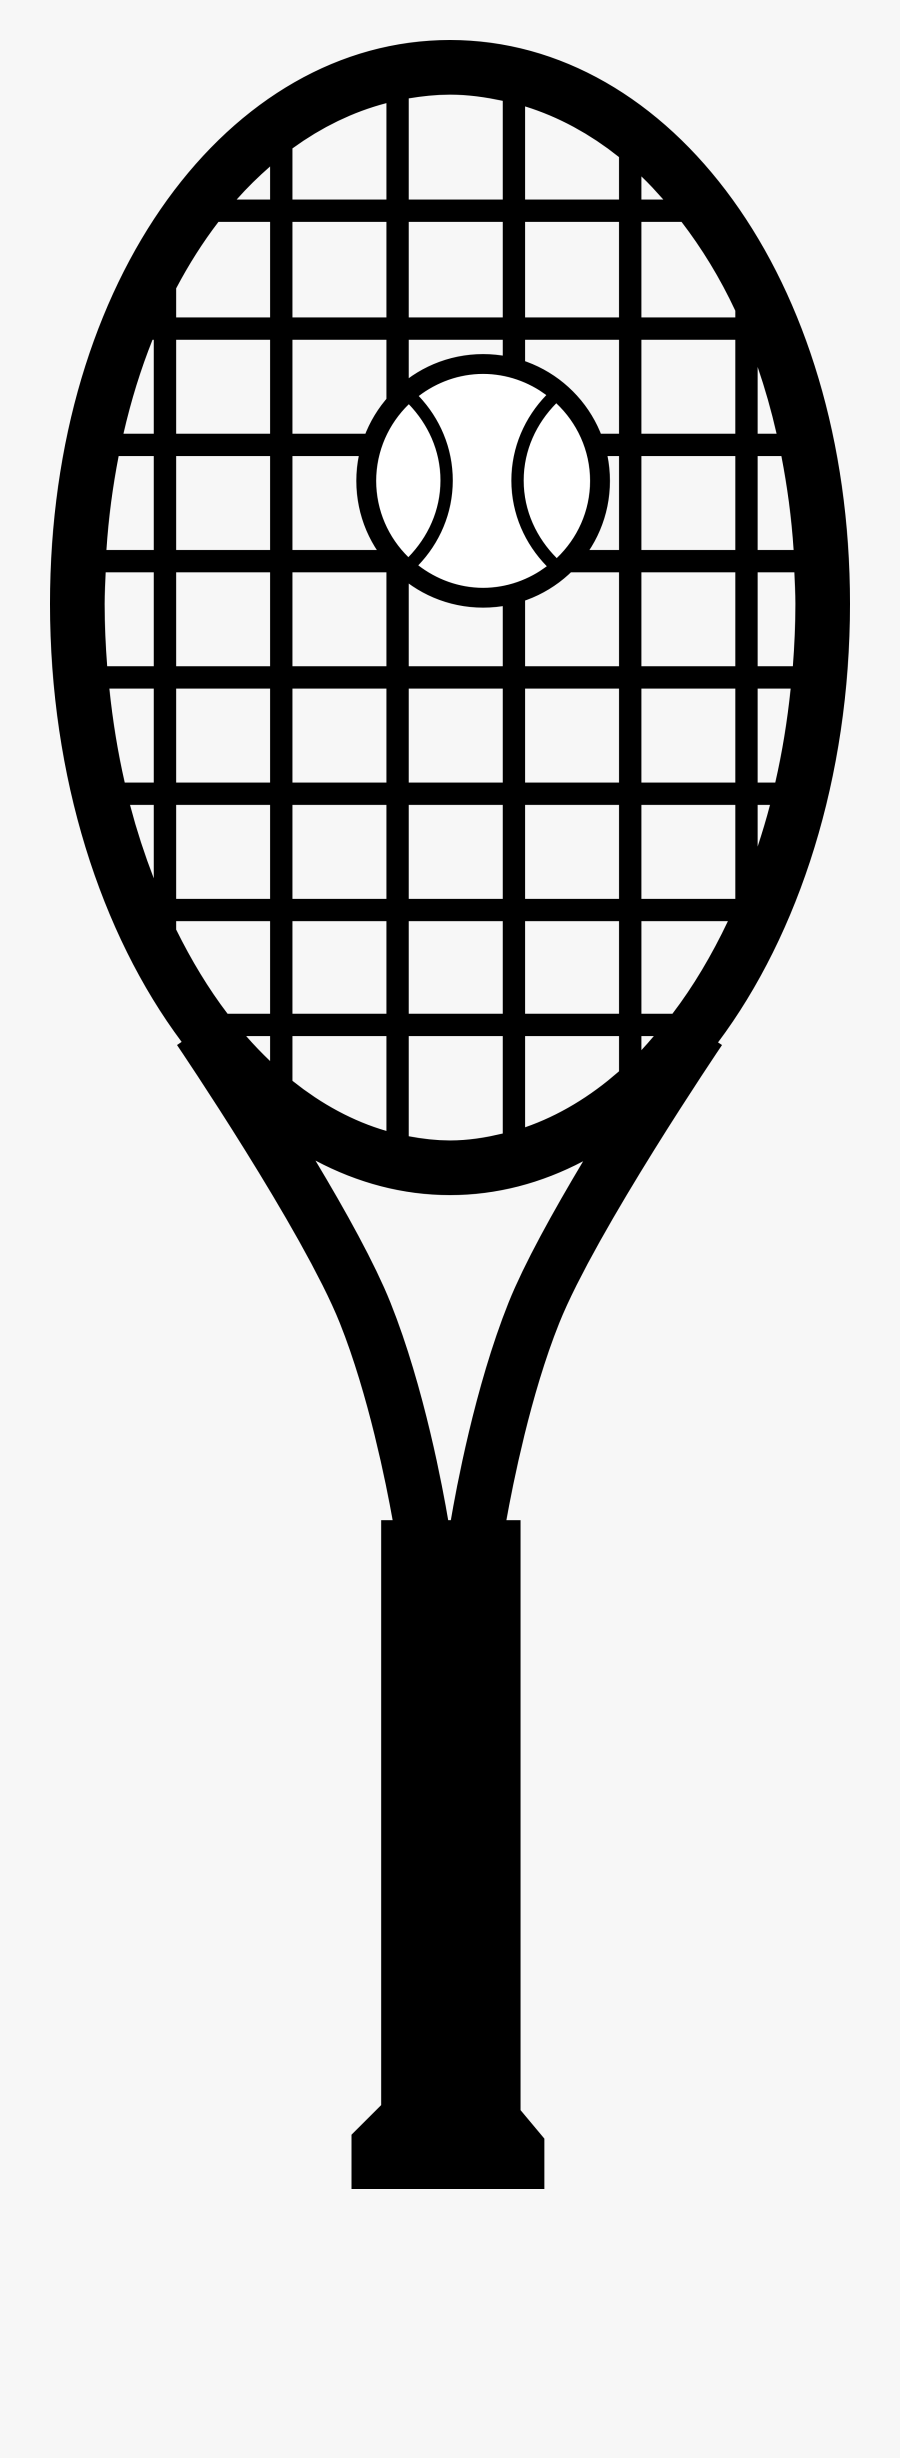 Clip Art Tennis Racket, Transparent Clipart